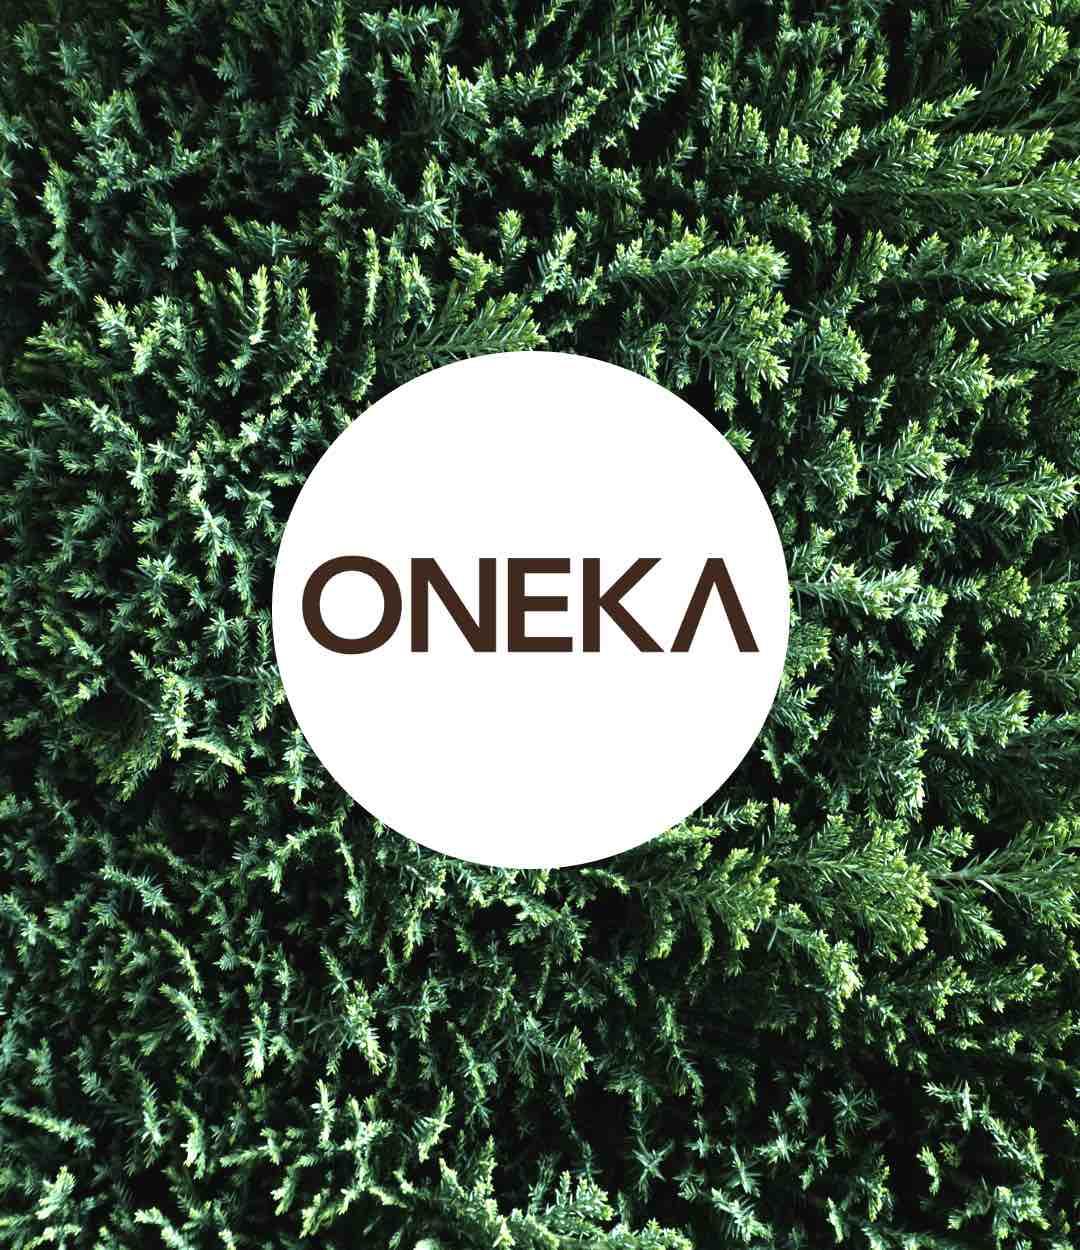 Transformation oneka elements